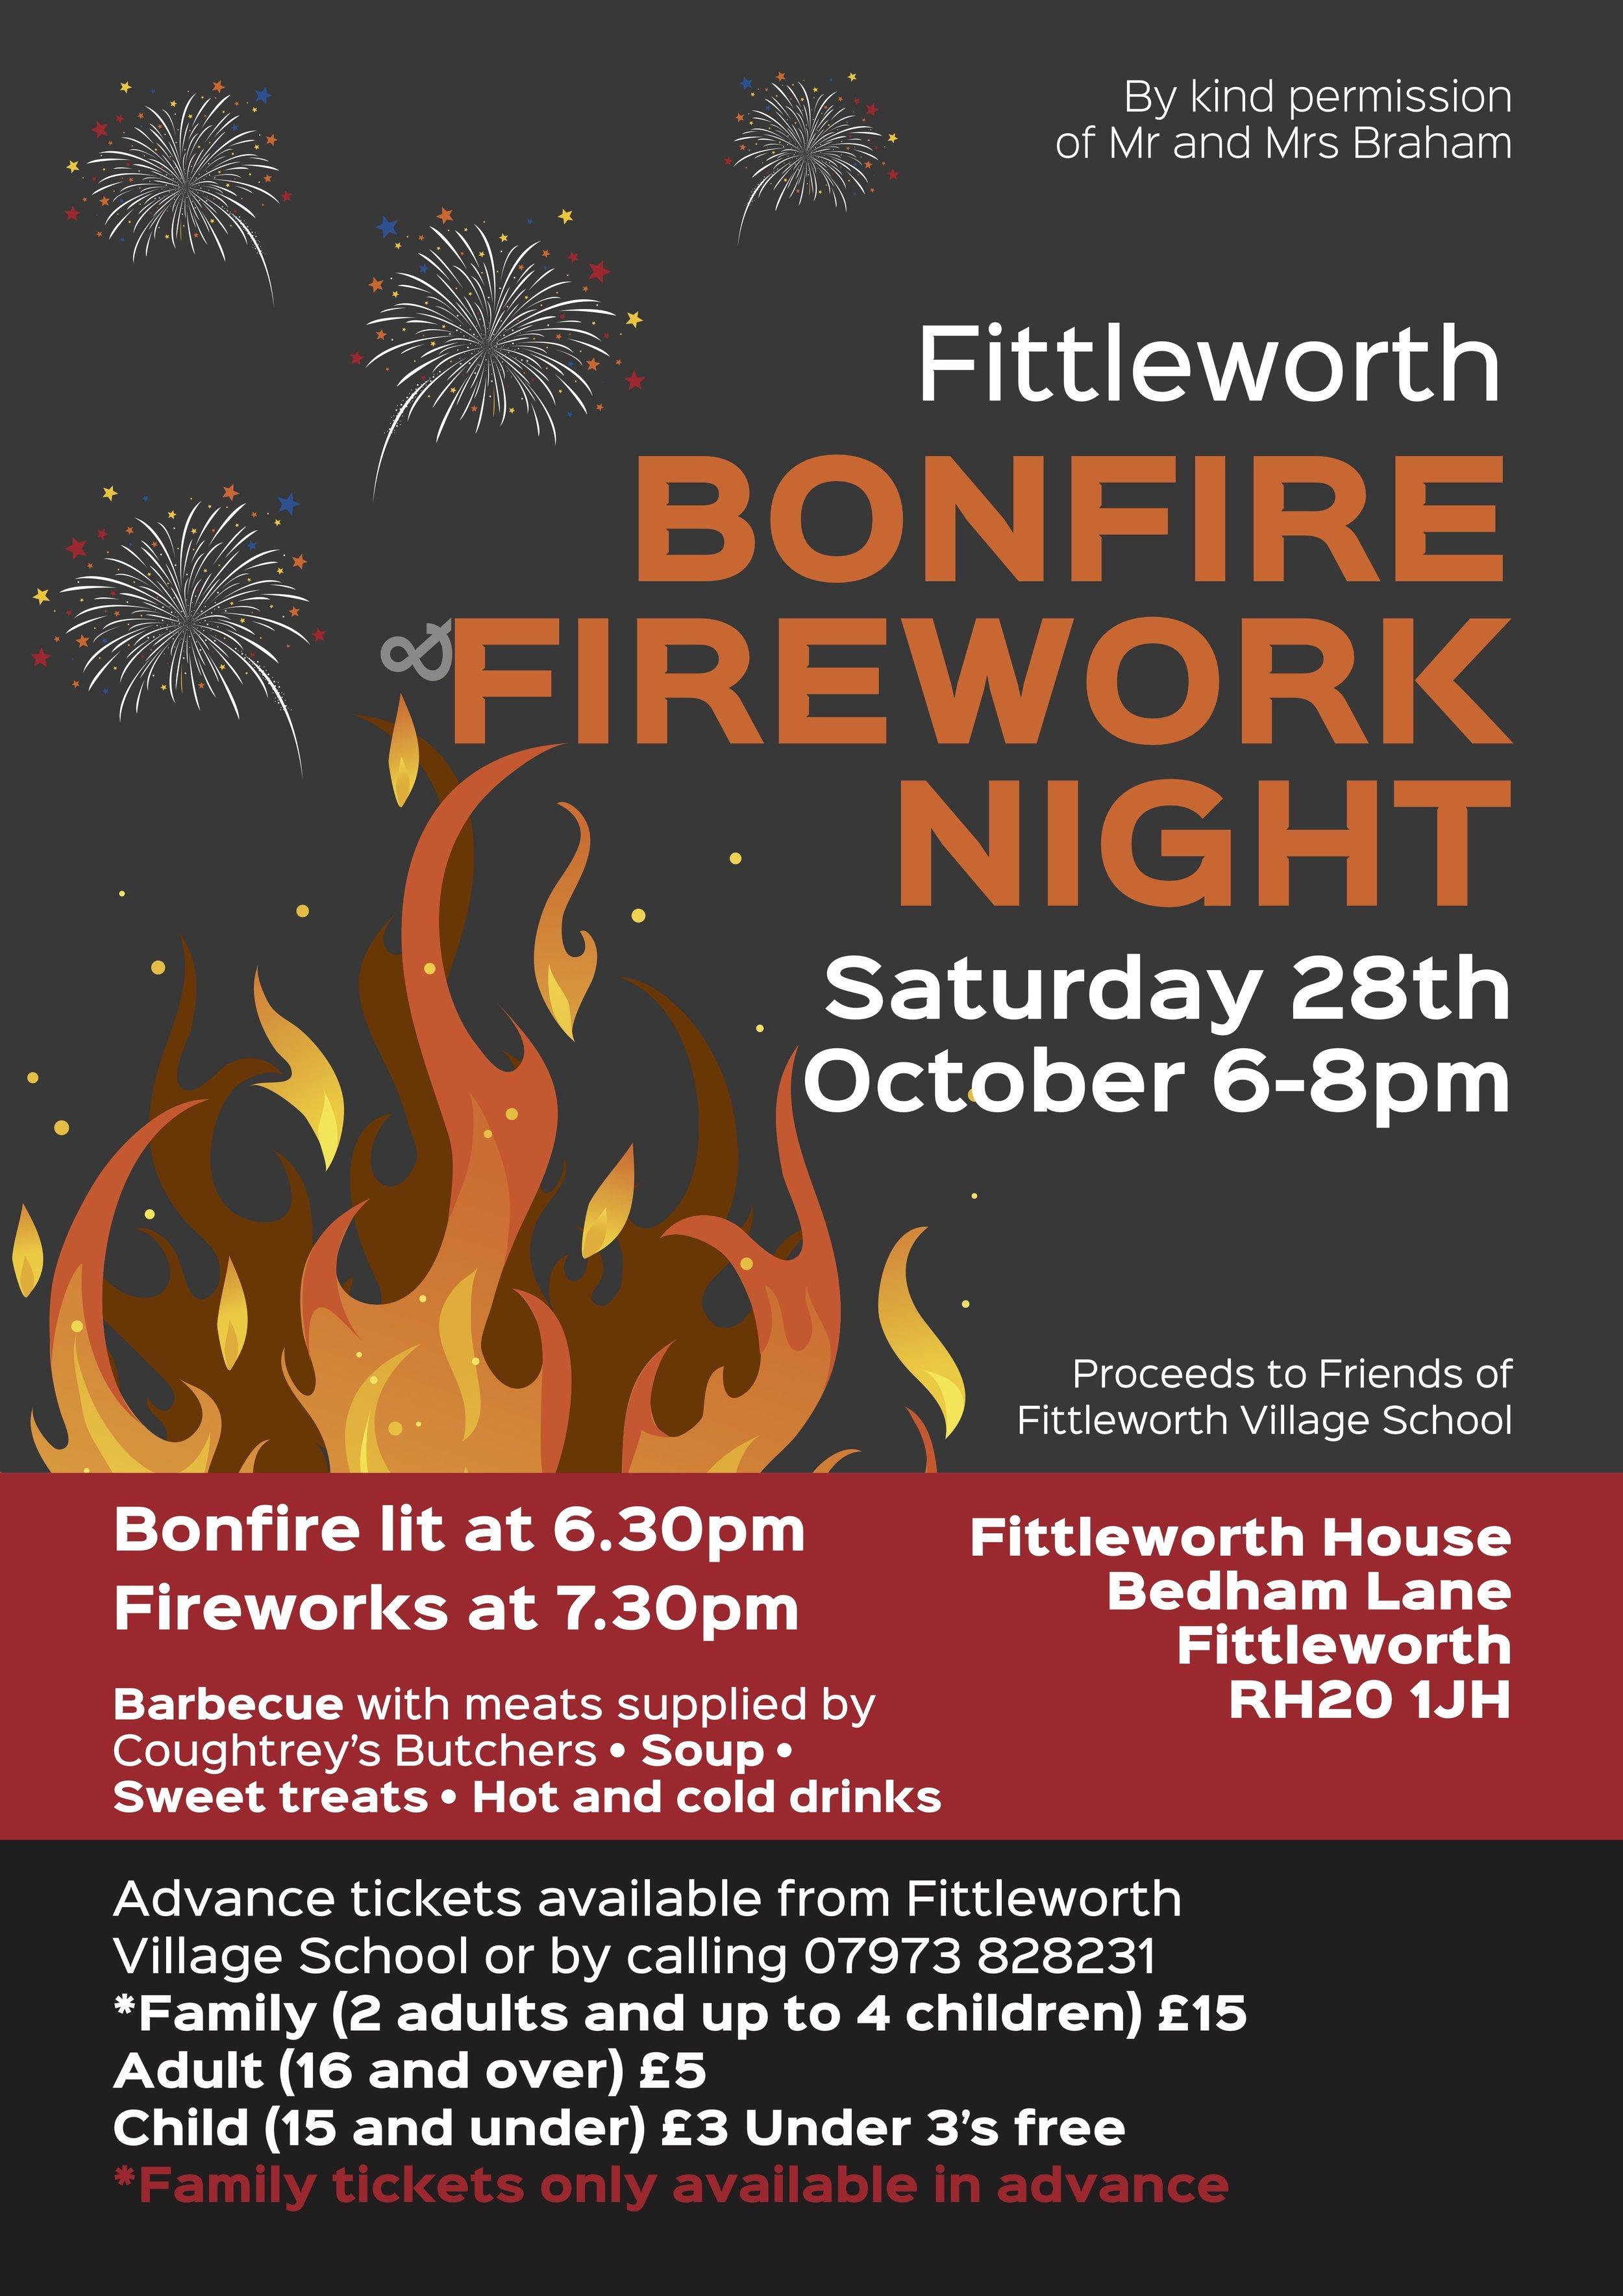 Fittleworth Bonfire Fireworks Night